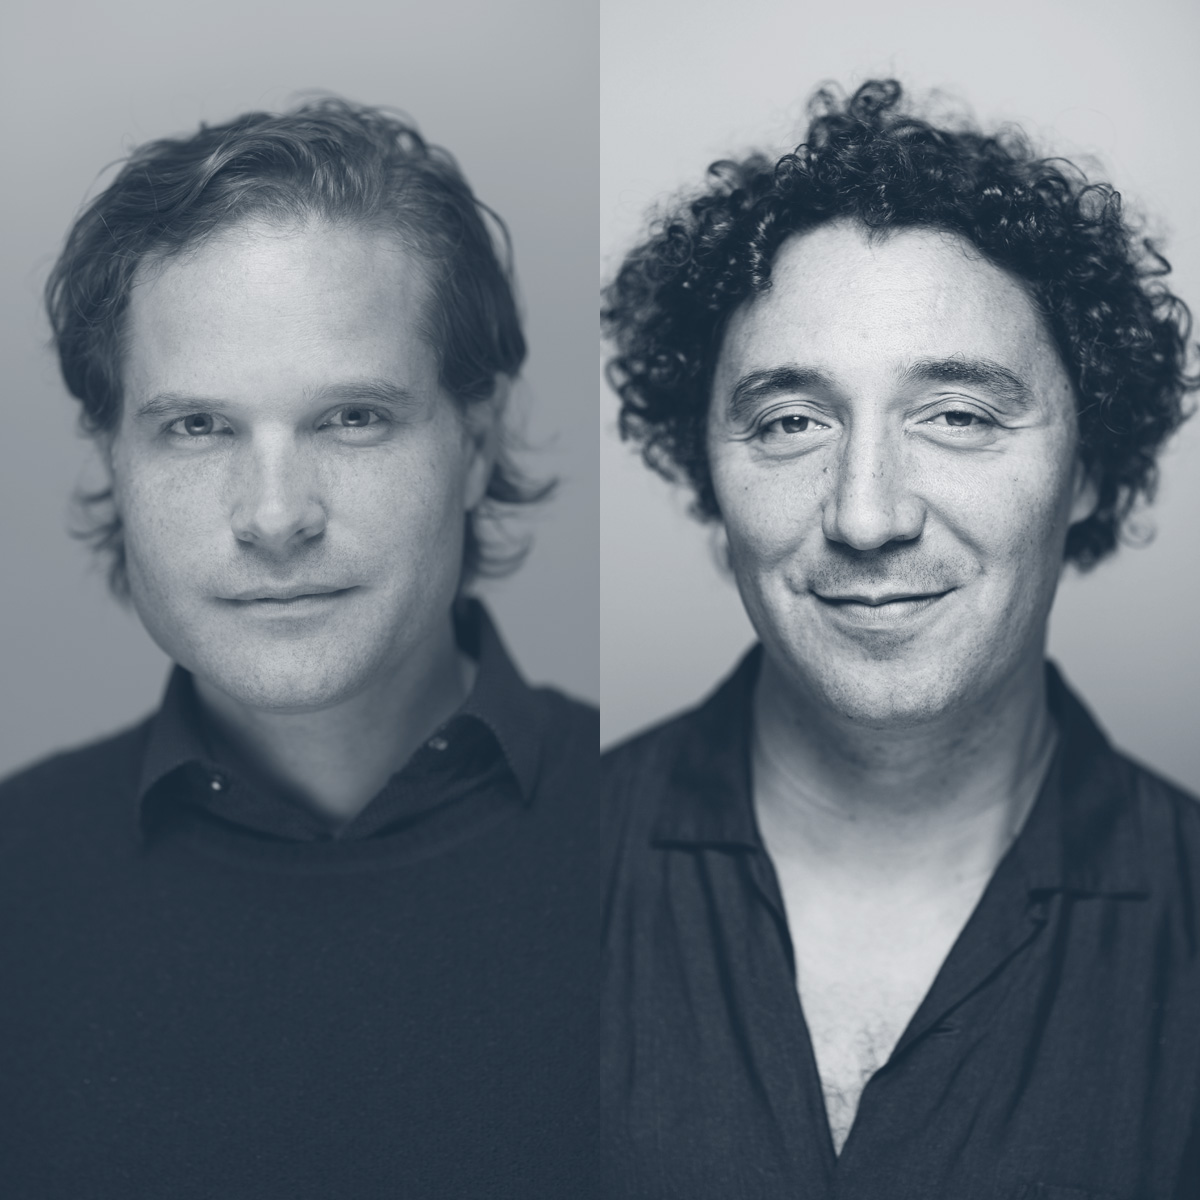 Alex Moulton & Elliott Chaffer